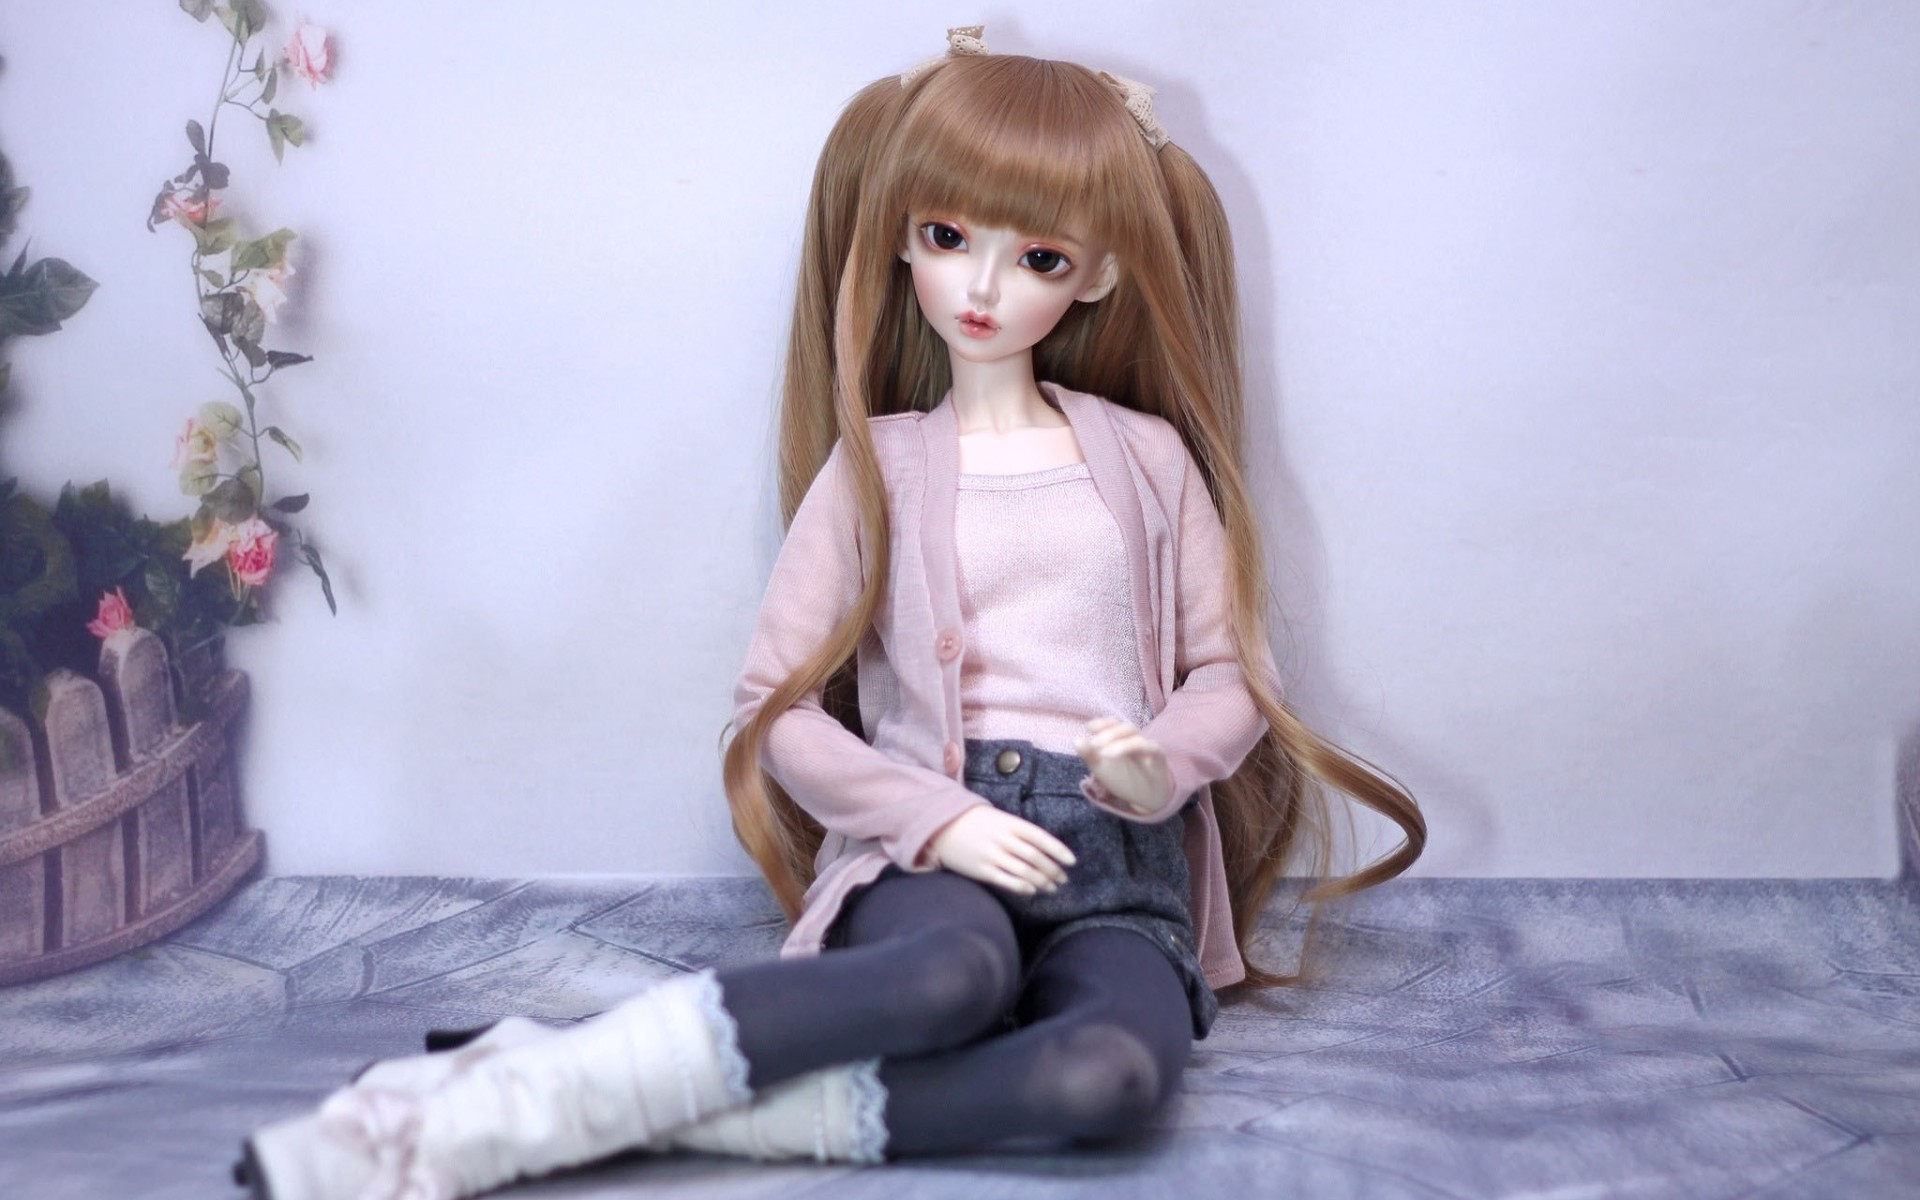 Doll Hd Wallpaper Background Image 1920x1200 Id 439411